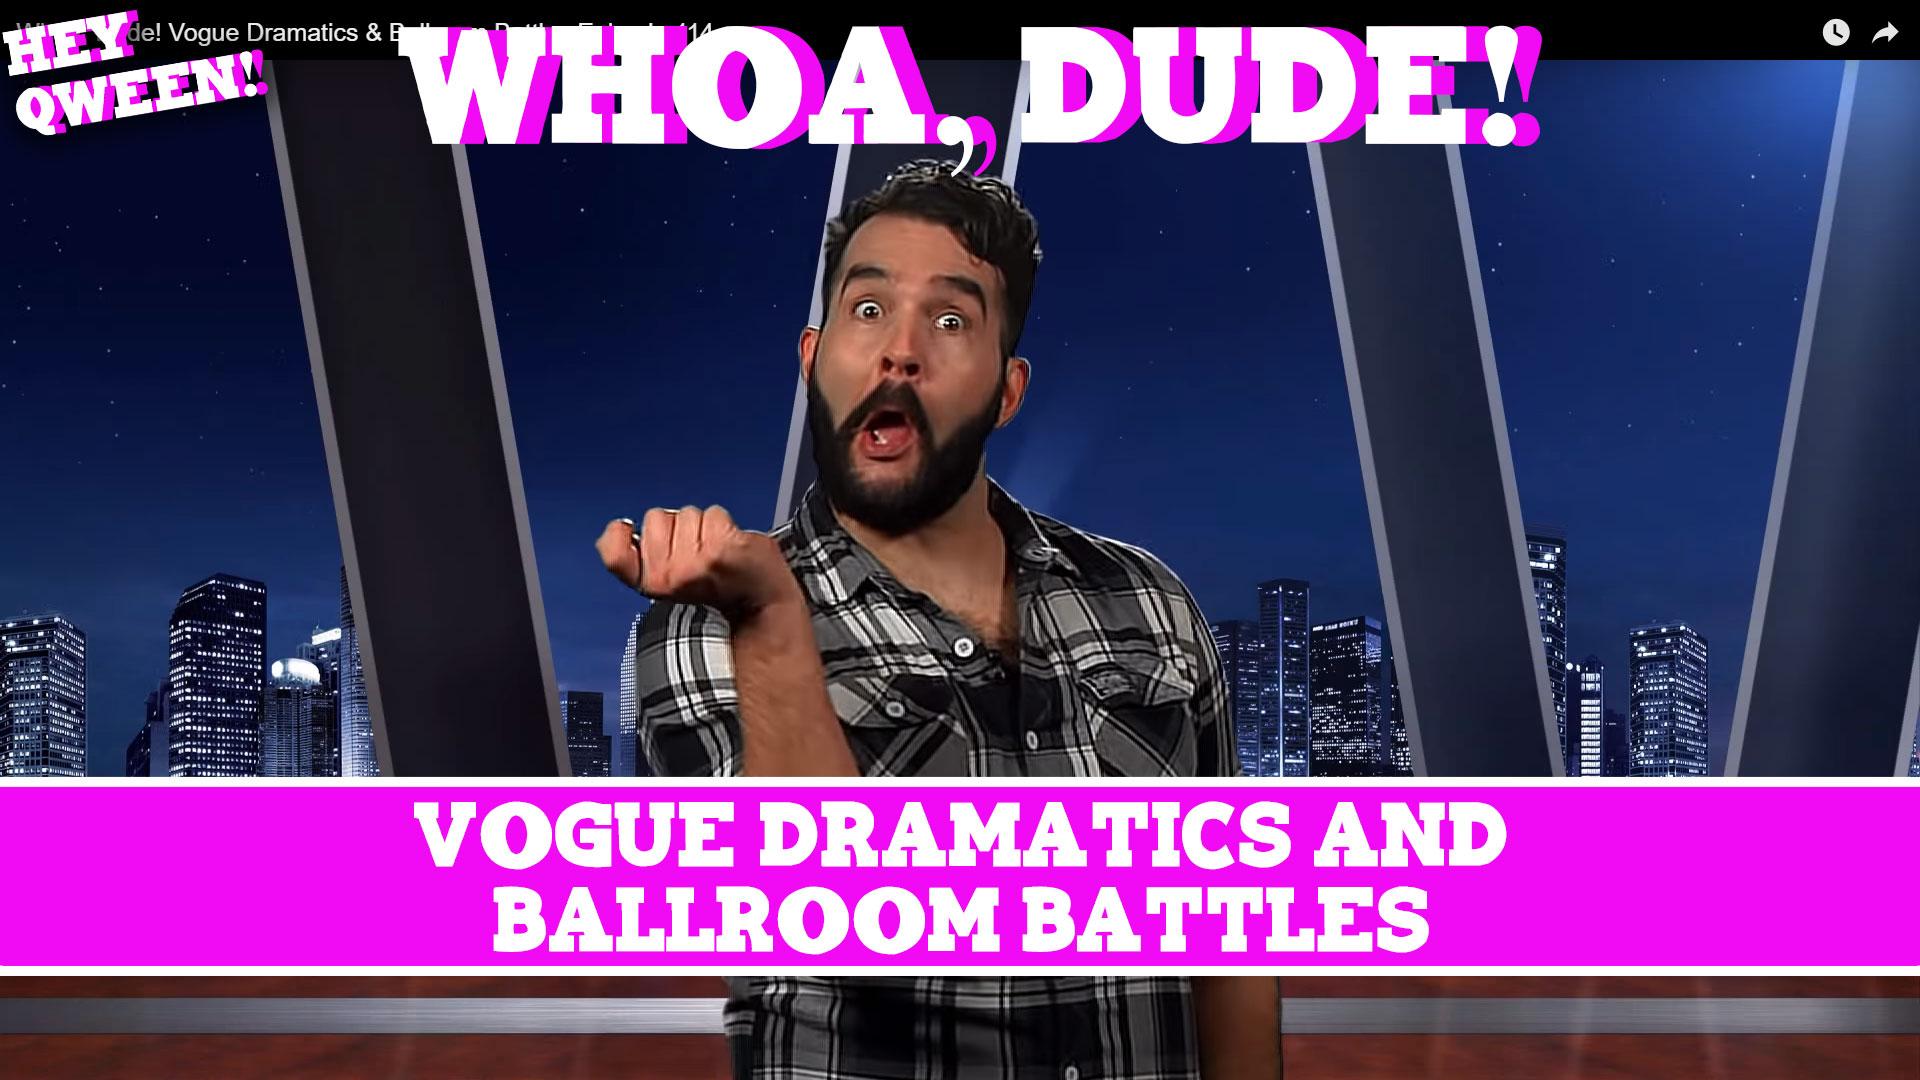 Whoa, Dude! Vogue Dramatics & Ballroom Battles Episode 114